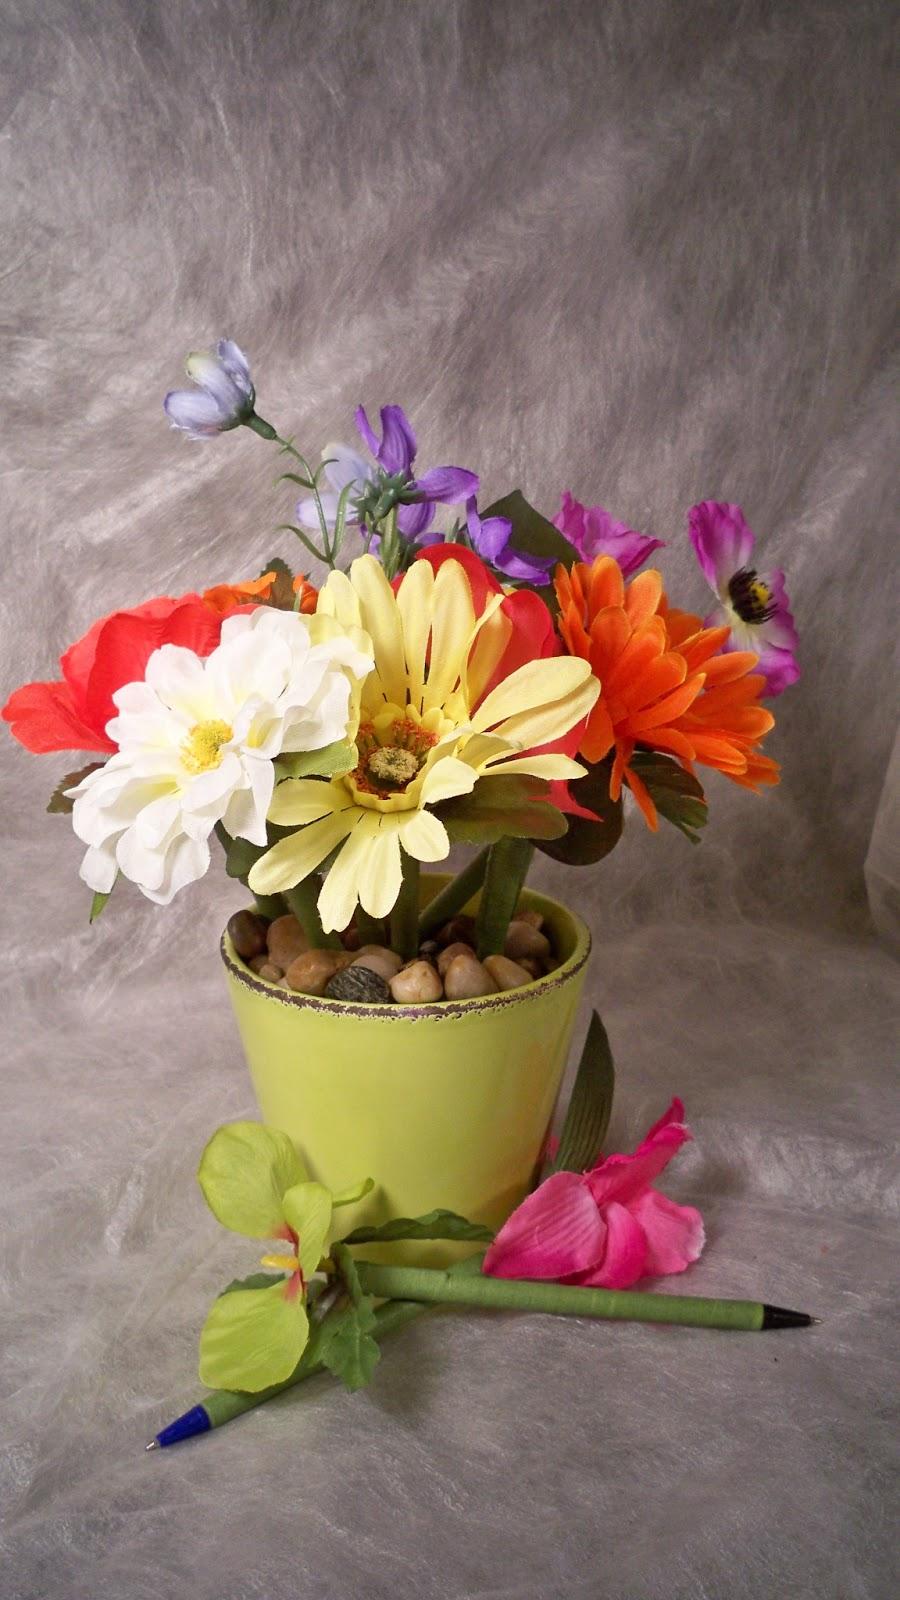 Kreations By Kendall: Flower Pen Bouquet